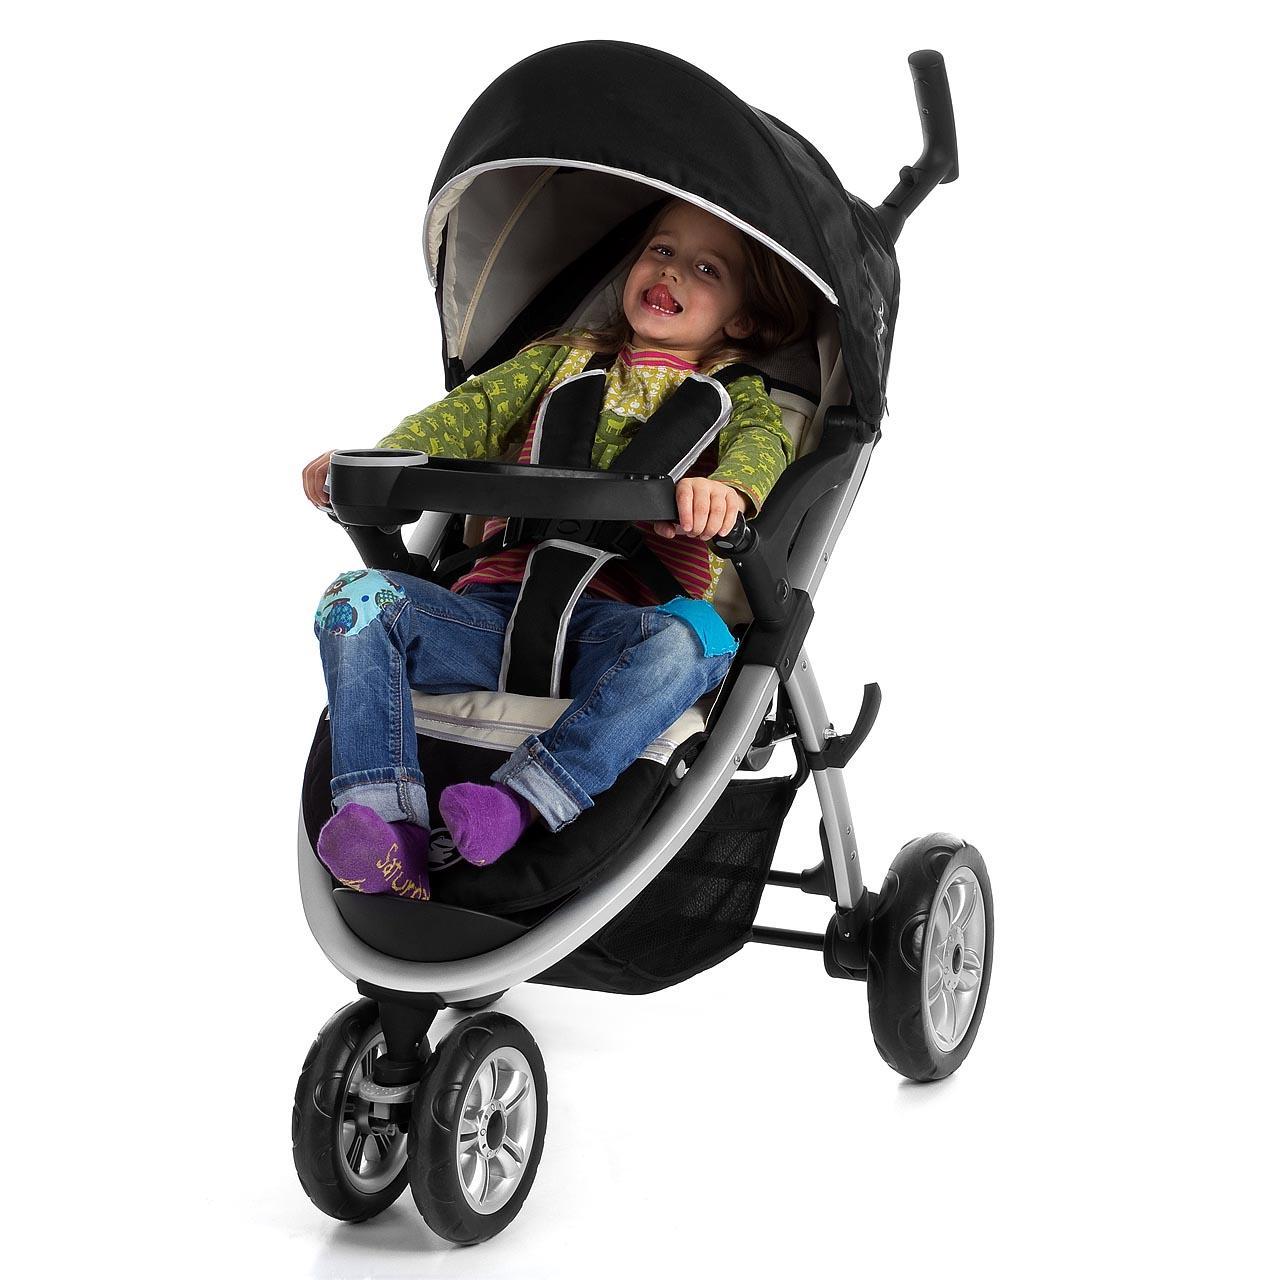 froggy buggy citybug kinderwagen baby sportwagen aluminium gefedert farbauswahl ebay. Black Bedroom Furniture Sets. Home Design Ideas